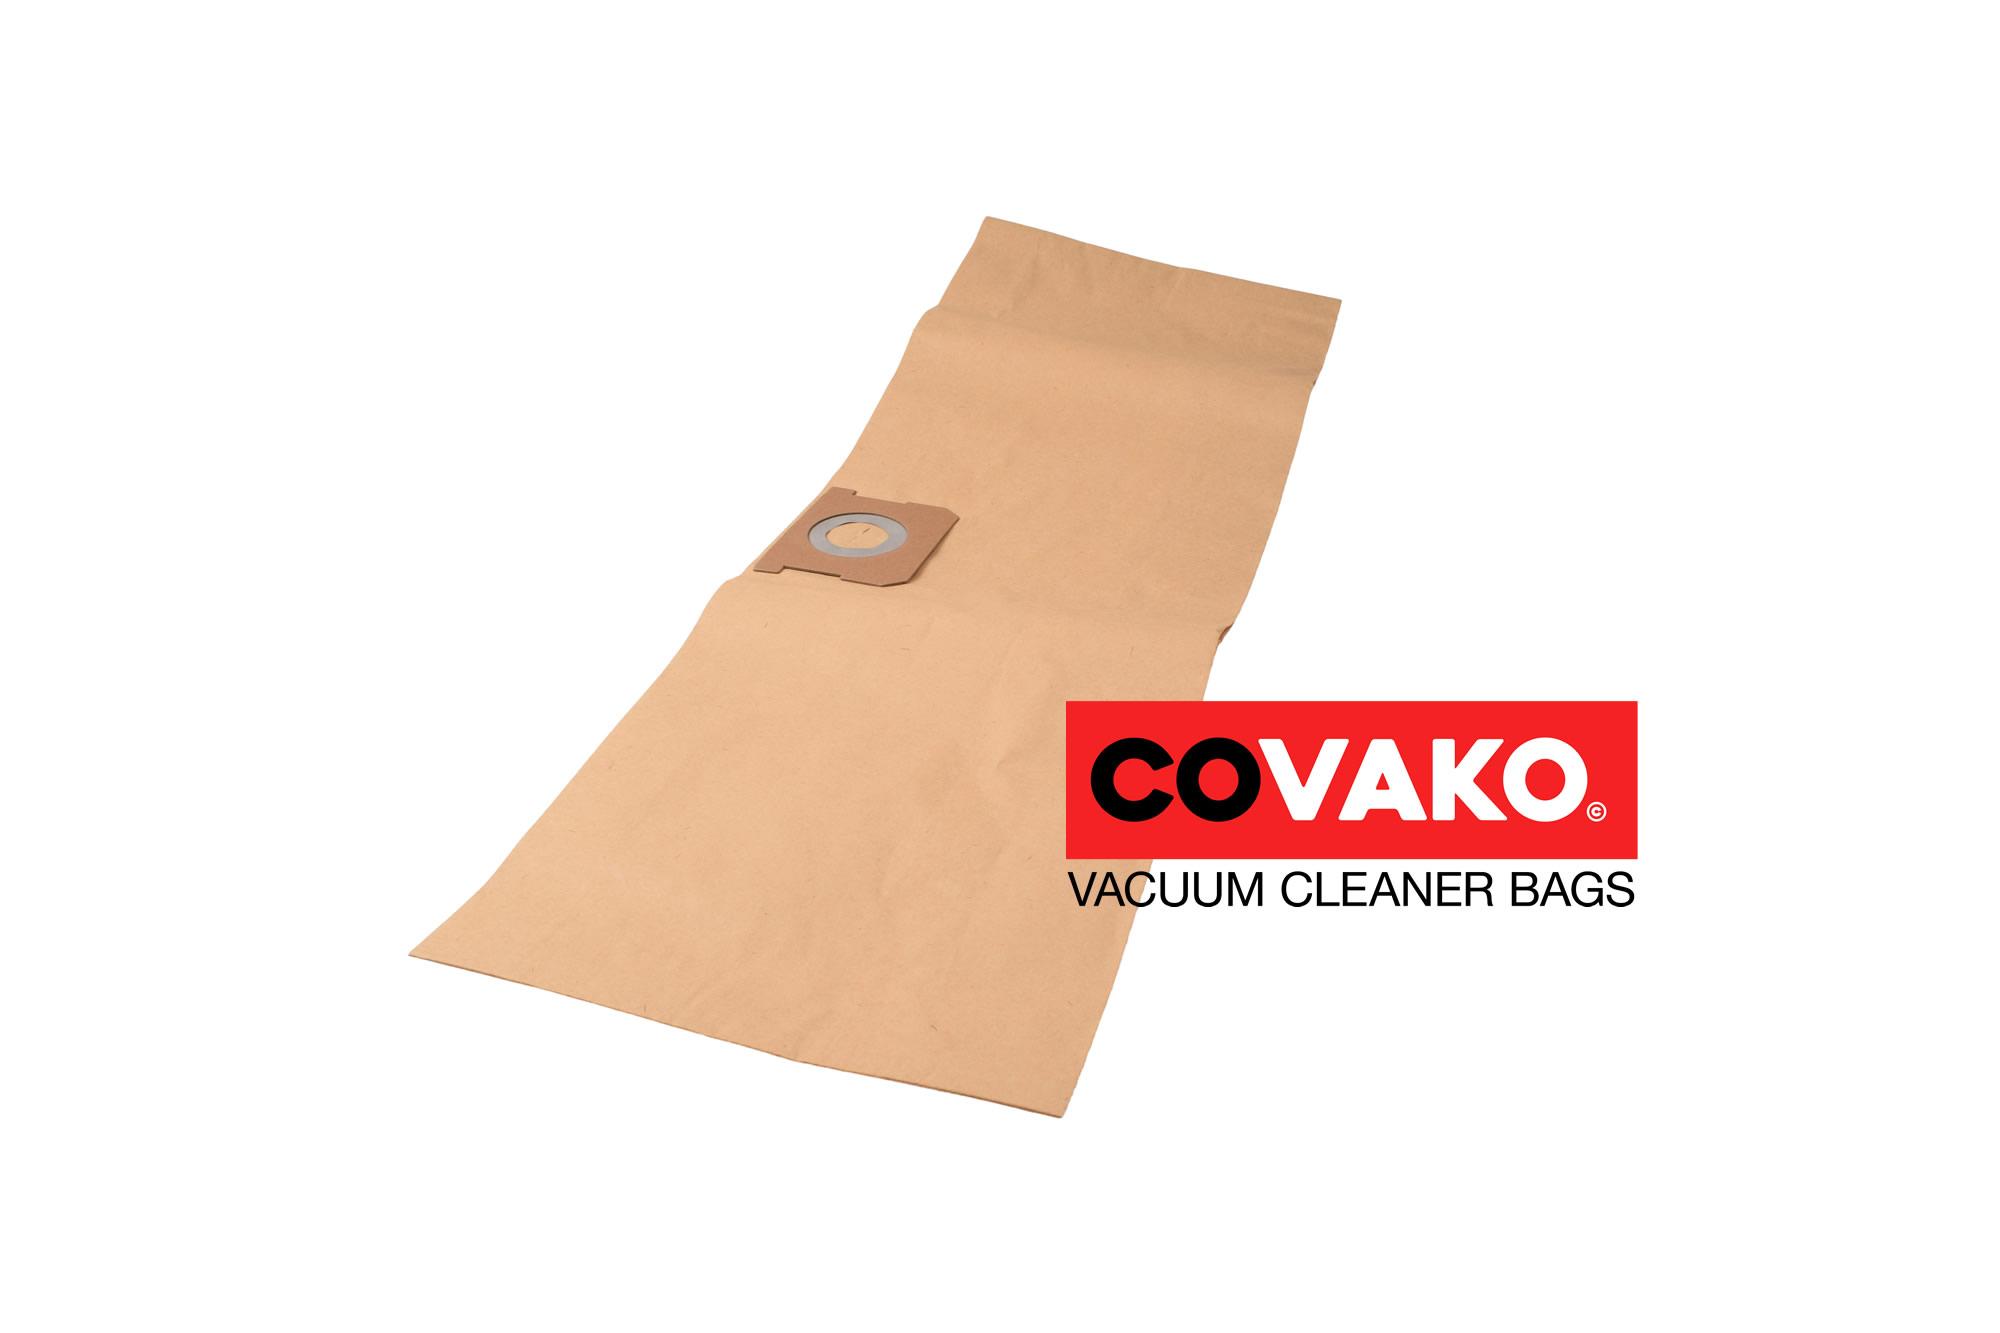 Bauhaus Shop Vac Pro 25 / Papier - Bauhaus Staubsaugerbeutel